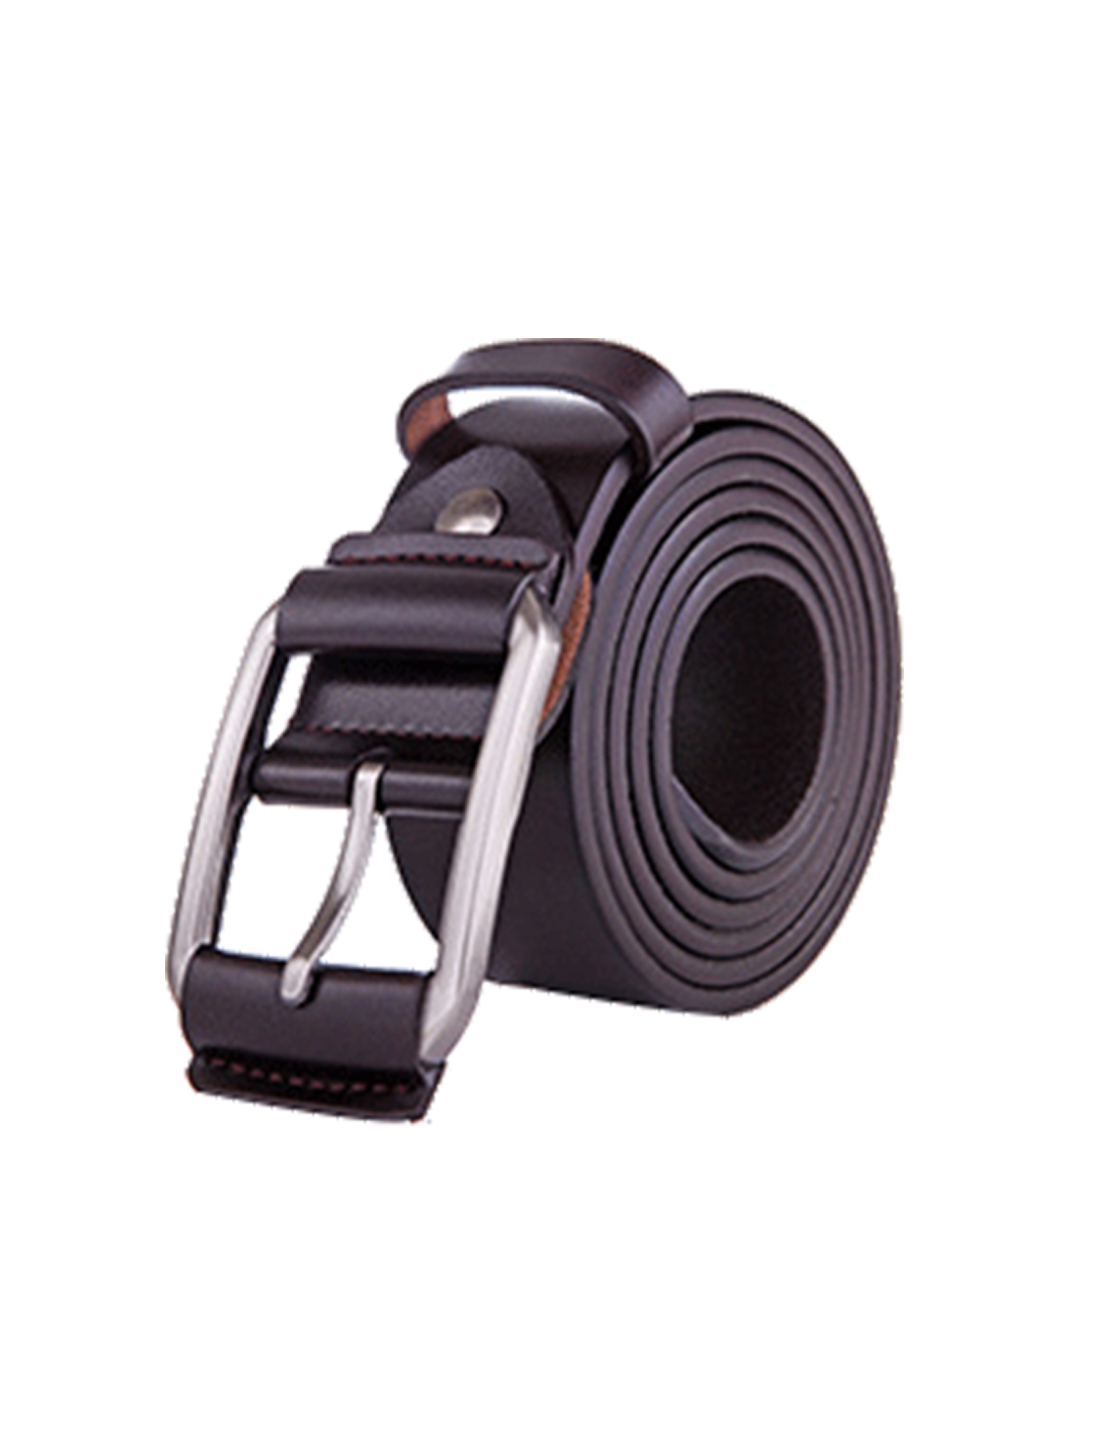 Men Solid Pin Buckle Dress Leather Belt 38mm Width 1 1/2 Dark Brown 120cm